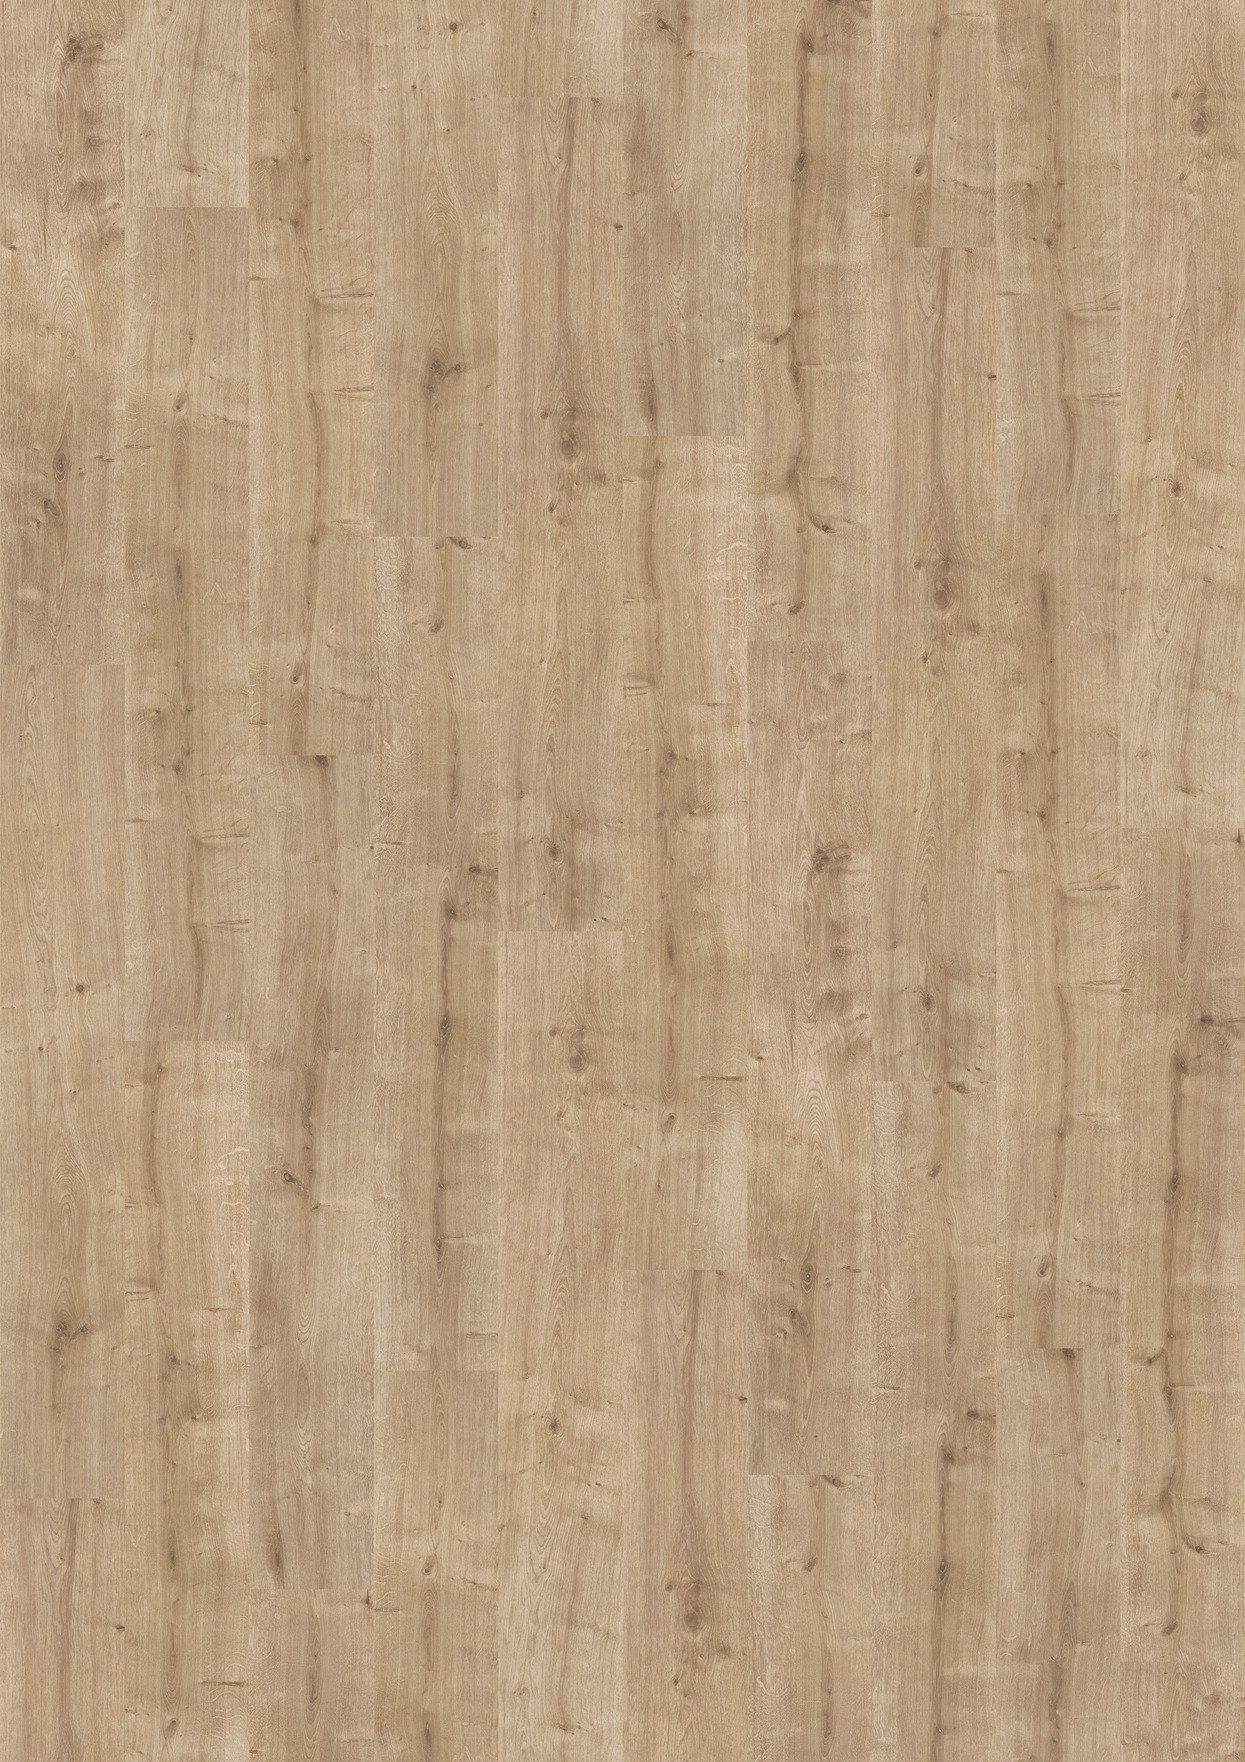 PARADOR Laminat »Basic 200 - Eiche«, 194 x 1285 mm